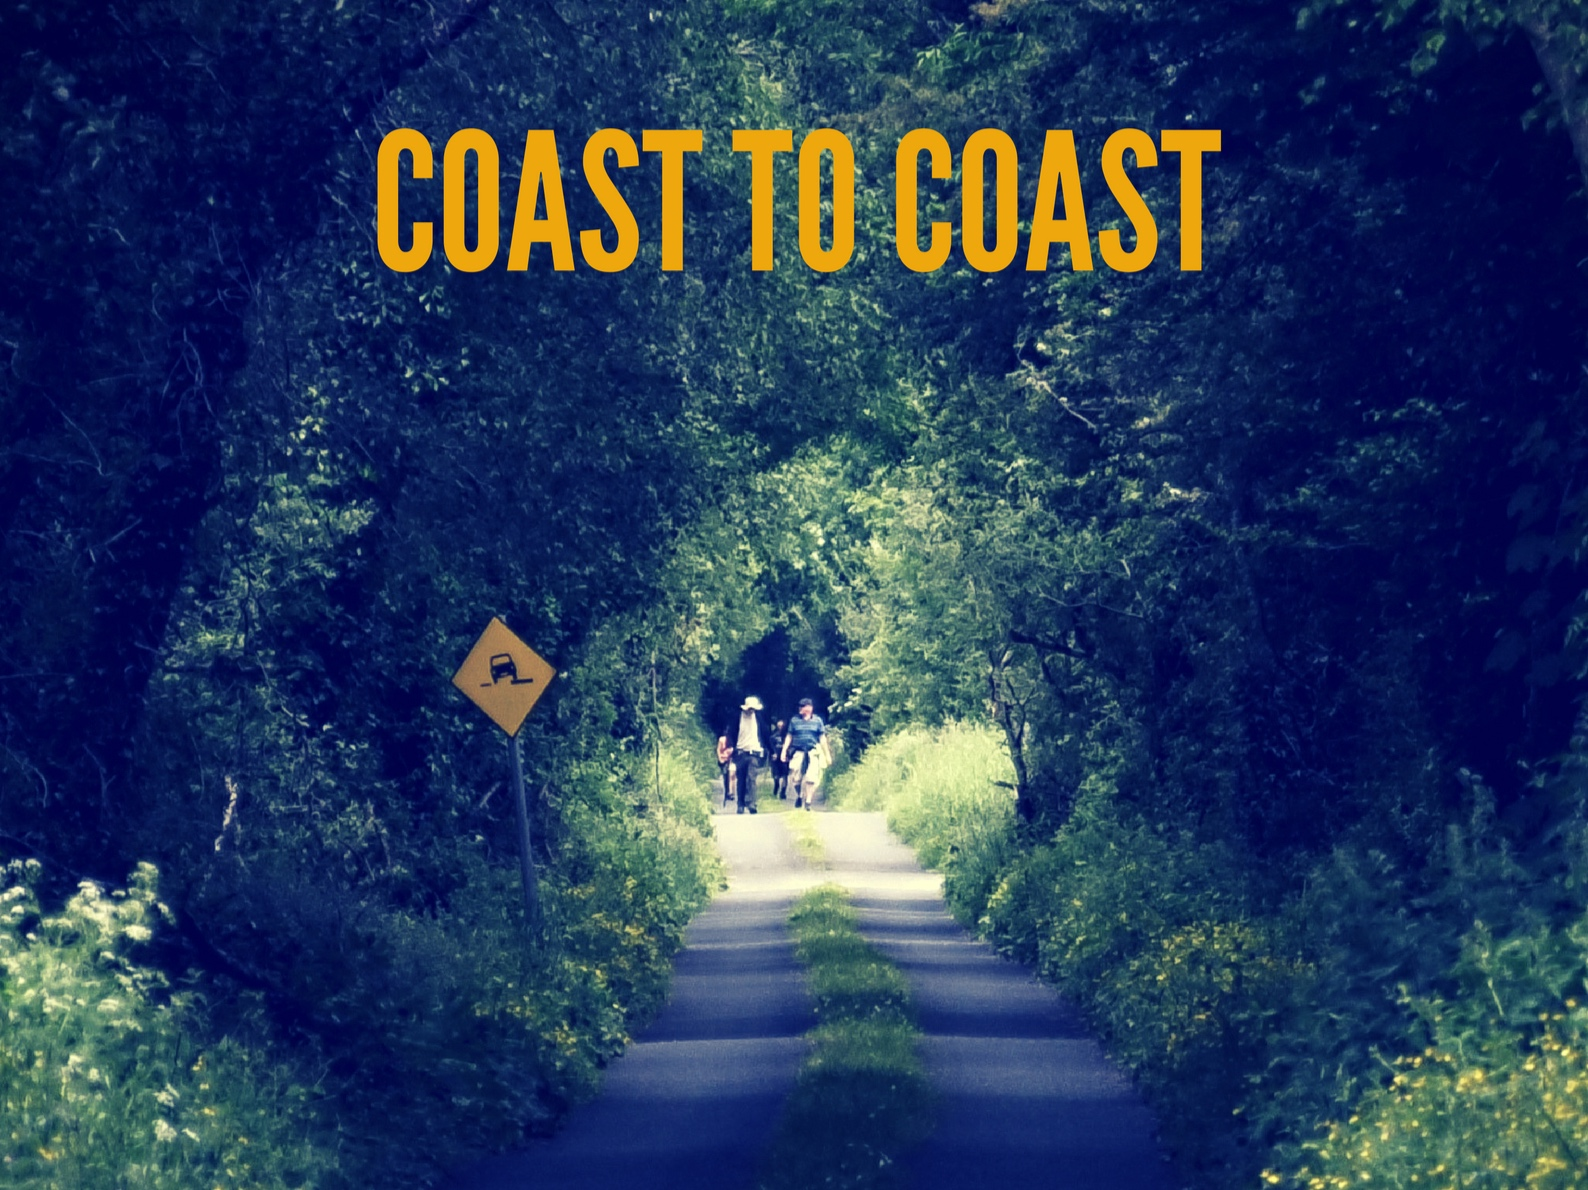 coast+to+coast+for+ifi-4.jpg